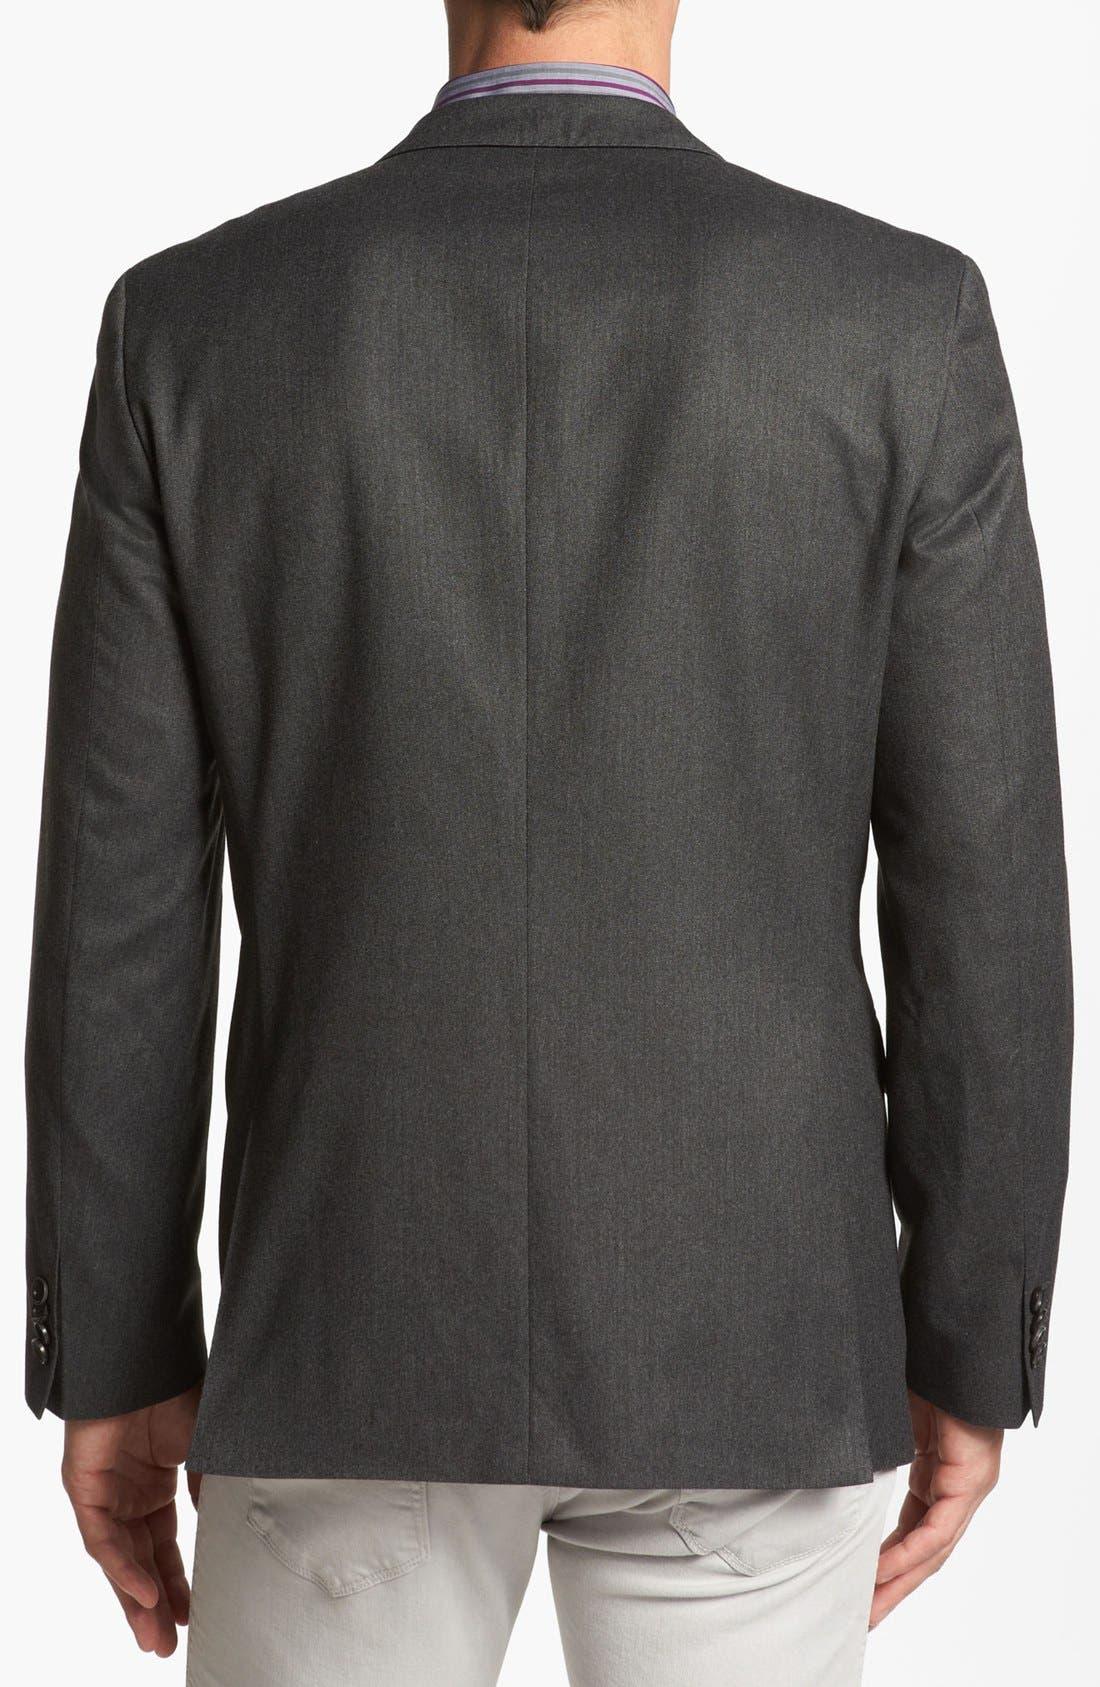 Alternate Image 2  - BOSS HUGO BOSS 'Coastes' Trim Fit Sportcoat